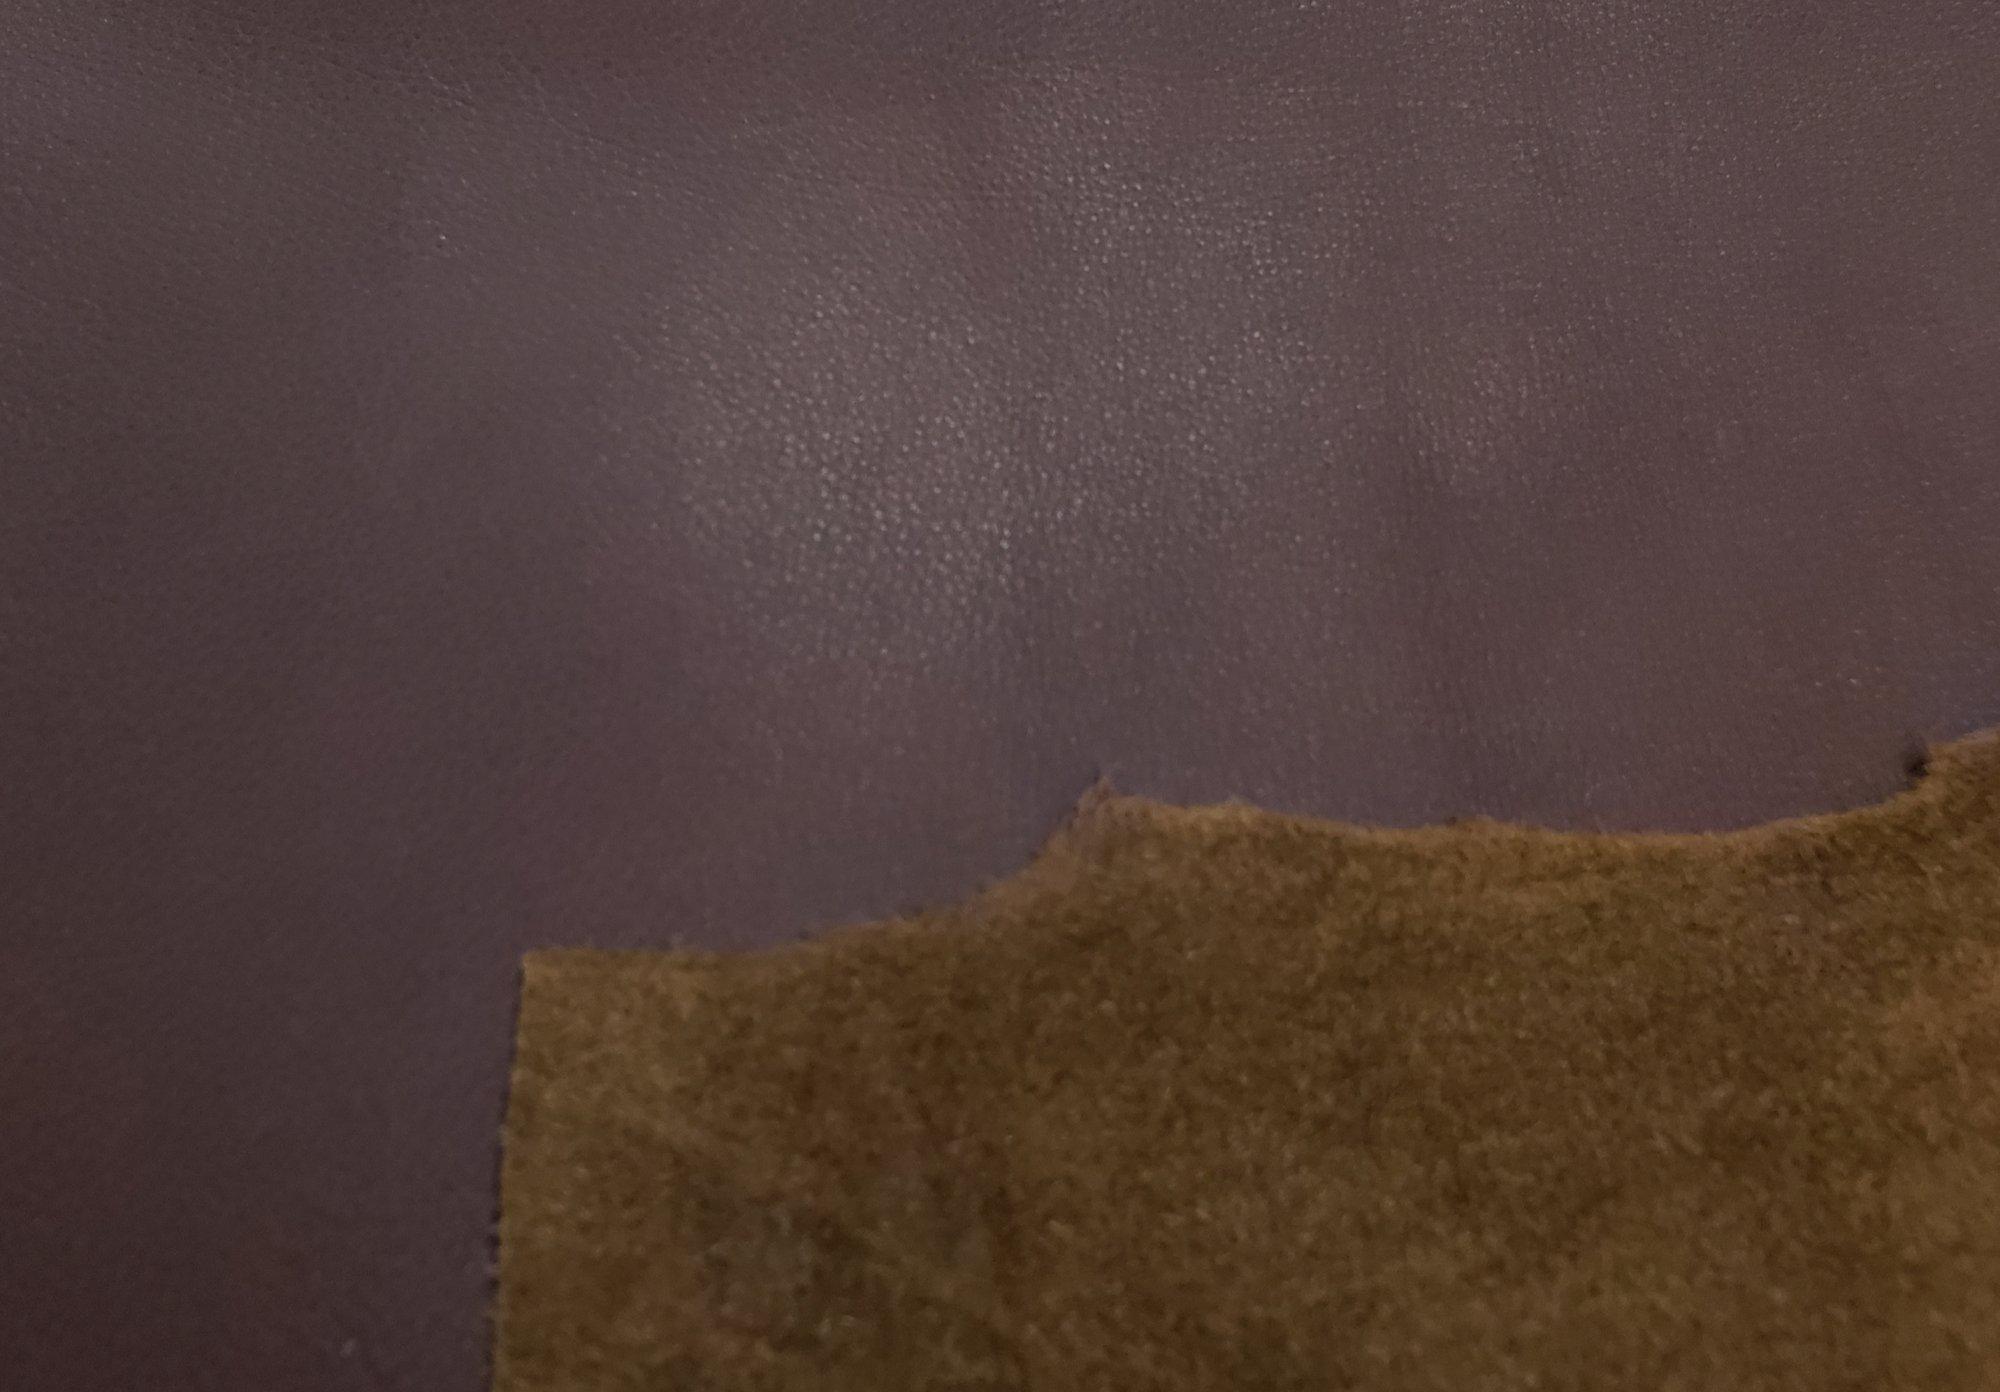 Cowhide Glove Tan Hazelnut - 24.50 sq.ft ($11.00/sq.ft)